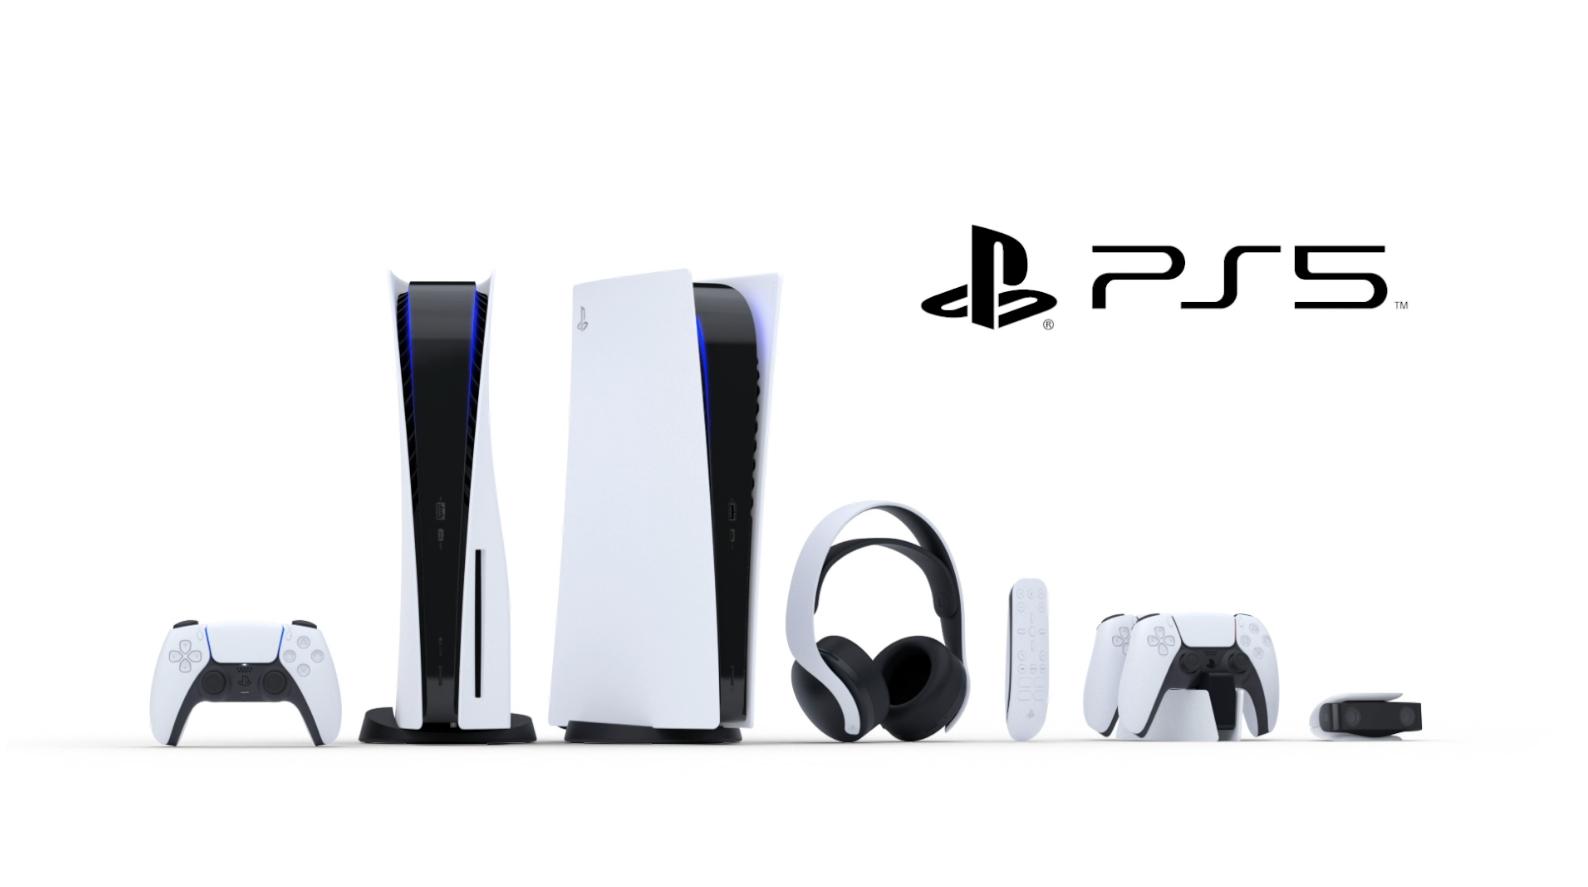 Diferentes modelos de PlayStation 5